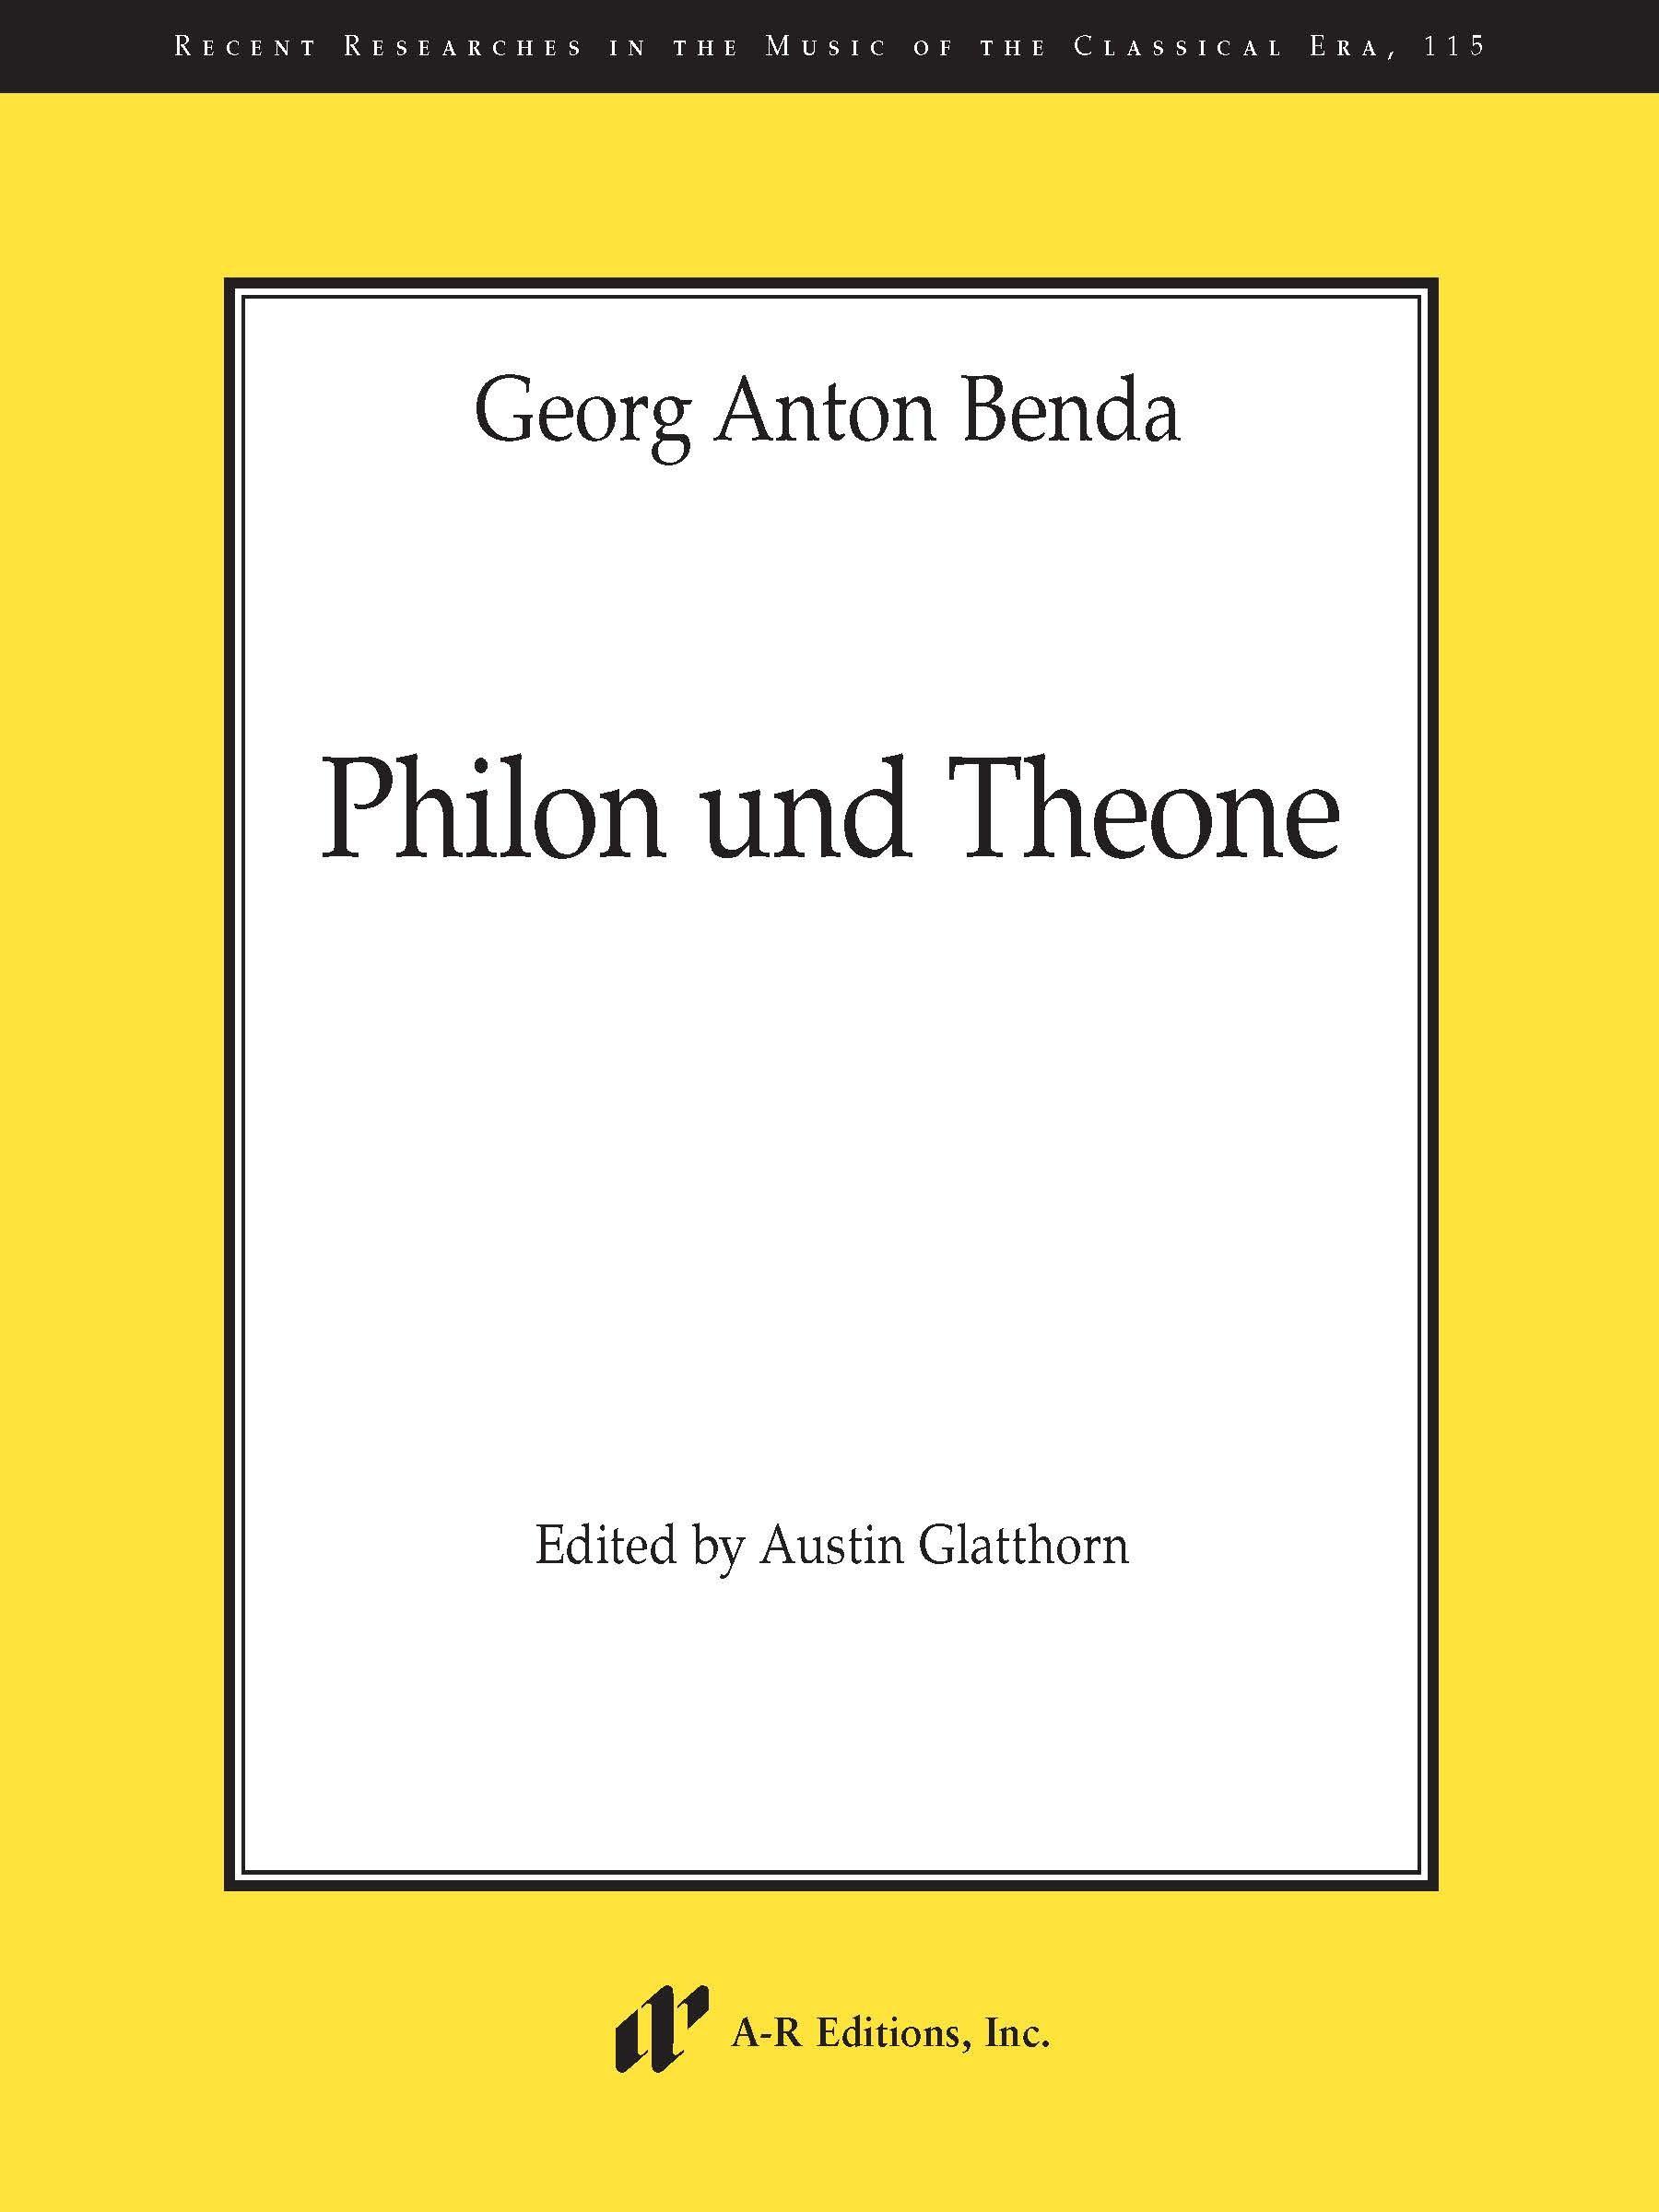 Benda: Philon und Theone